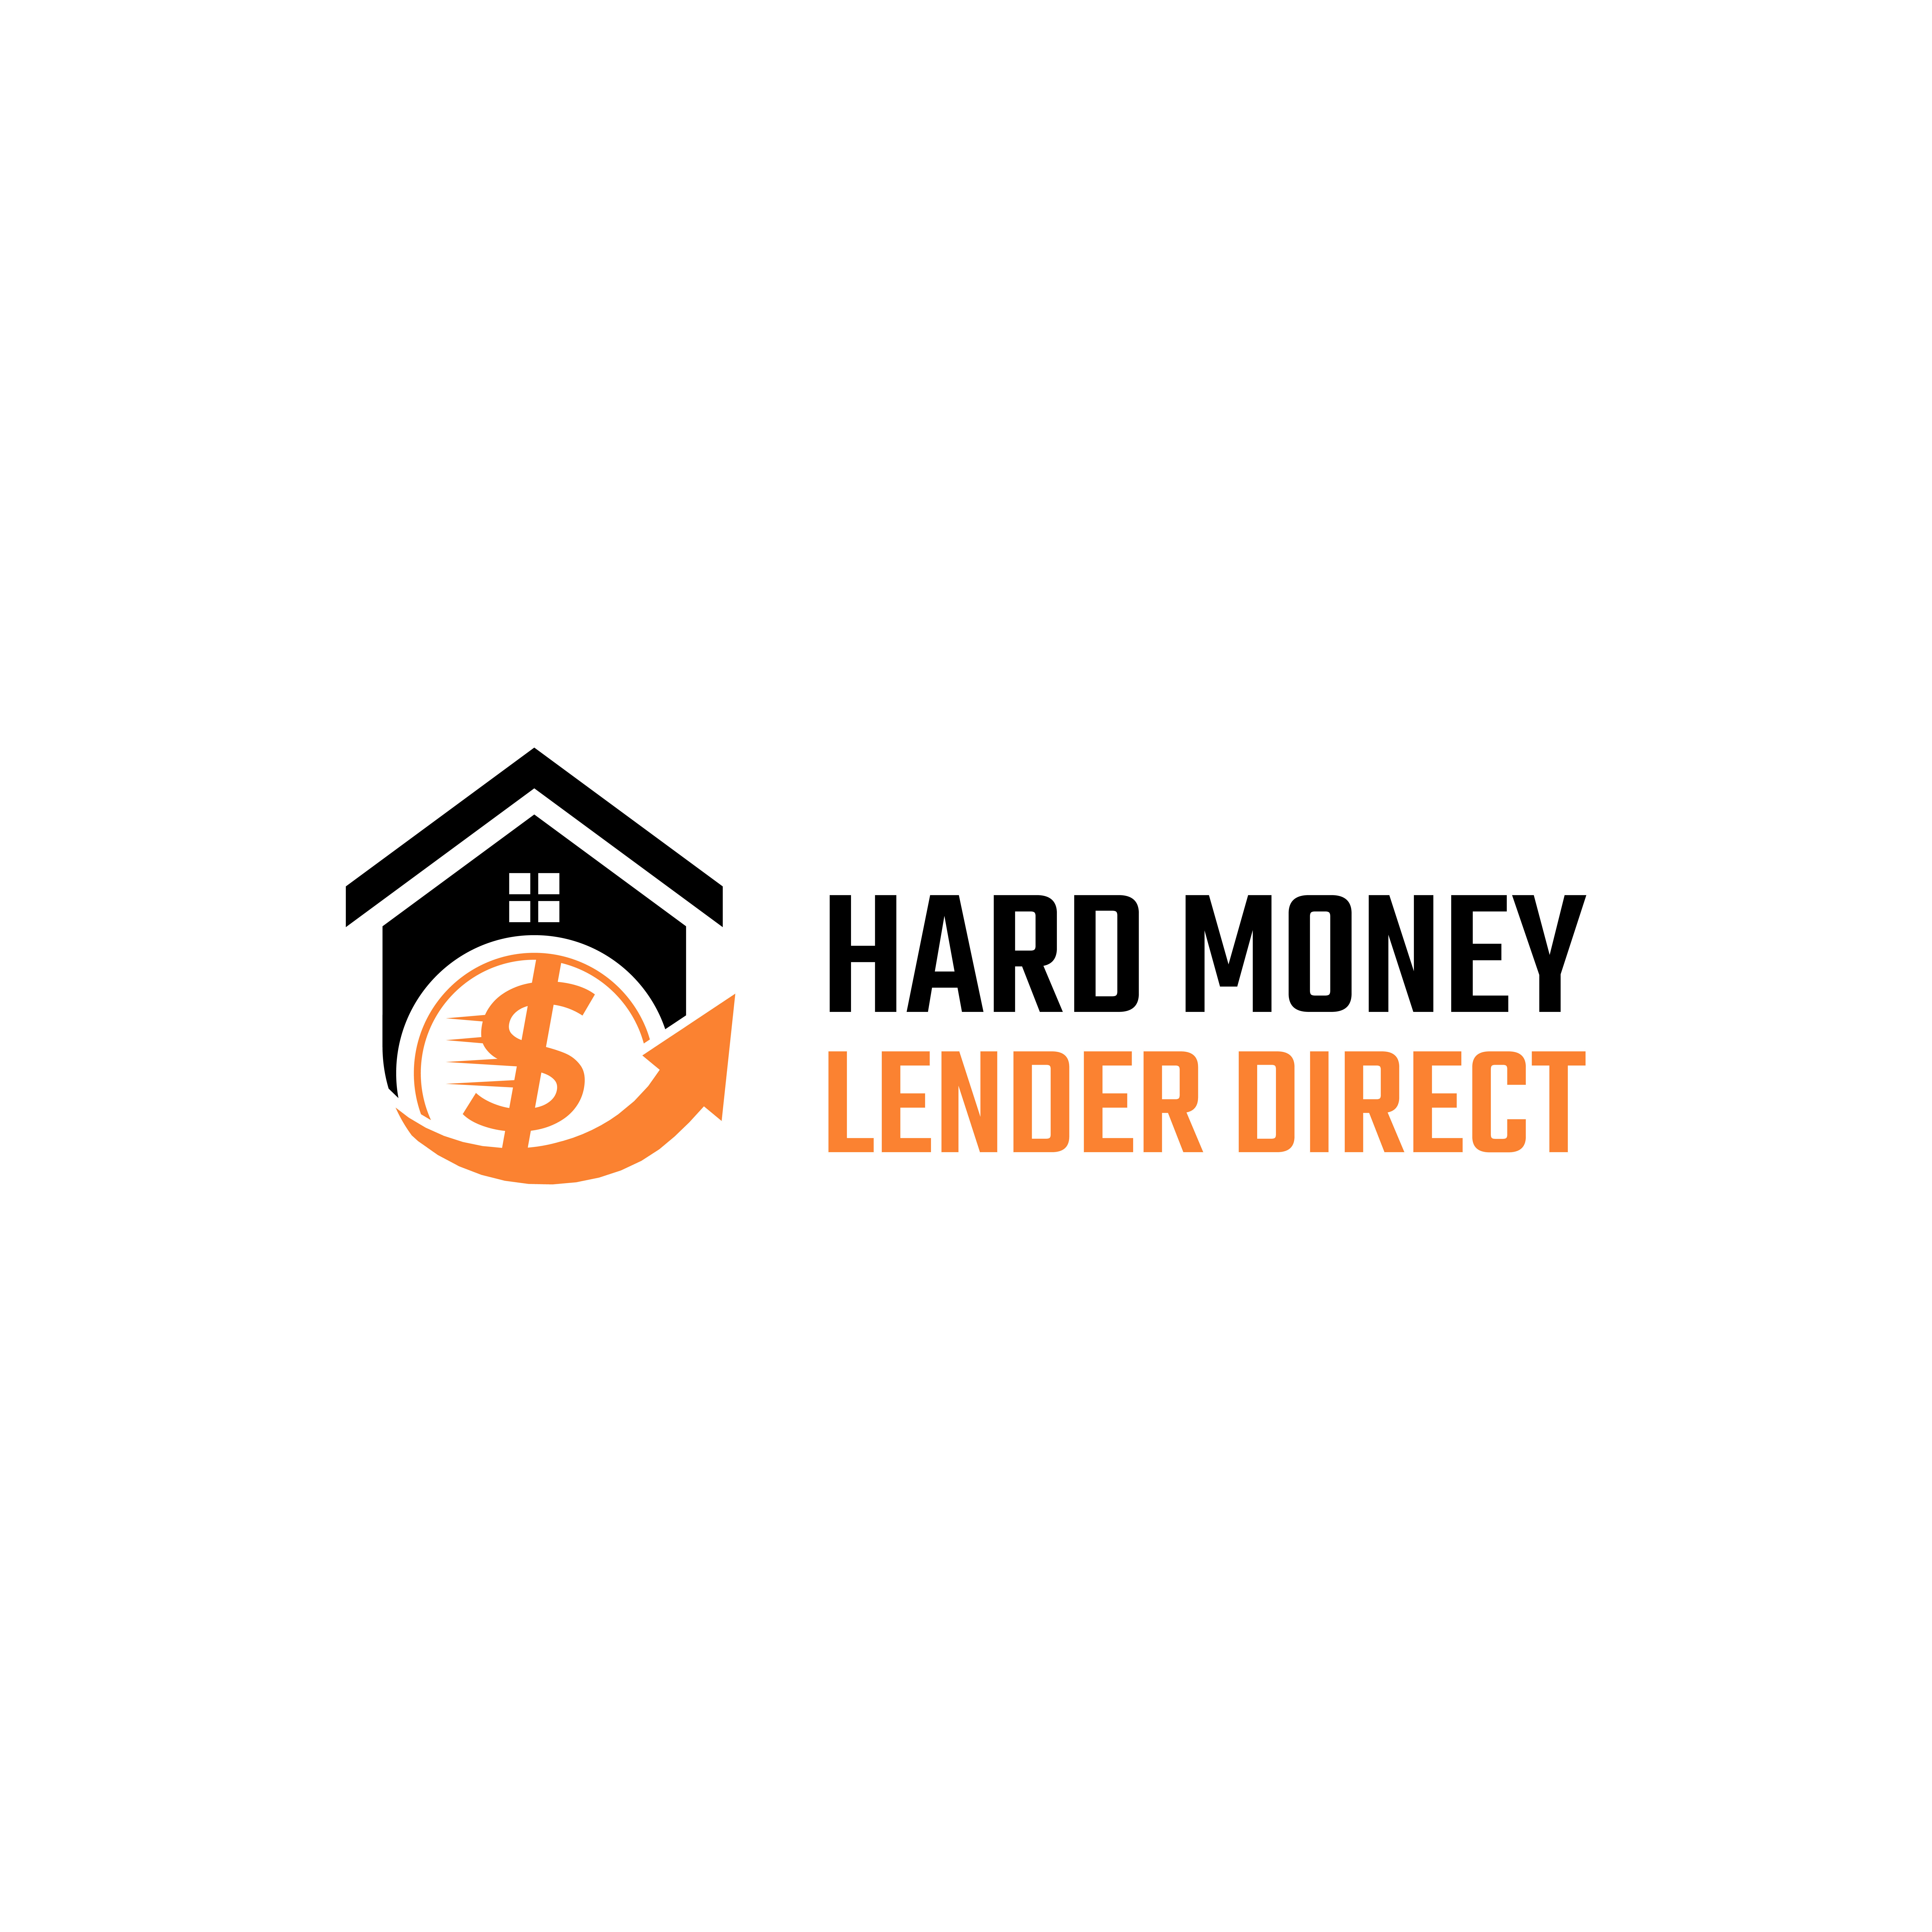 Hard Money Lender Direct review